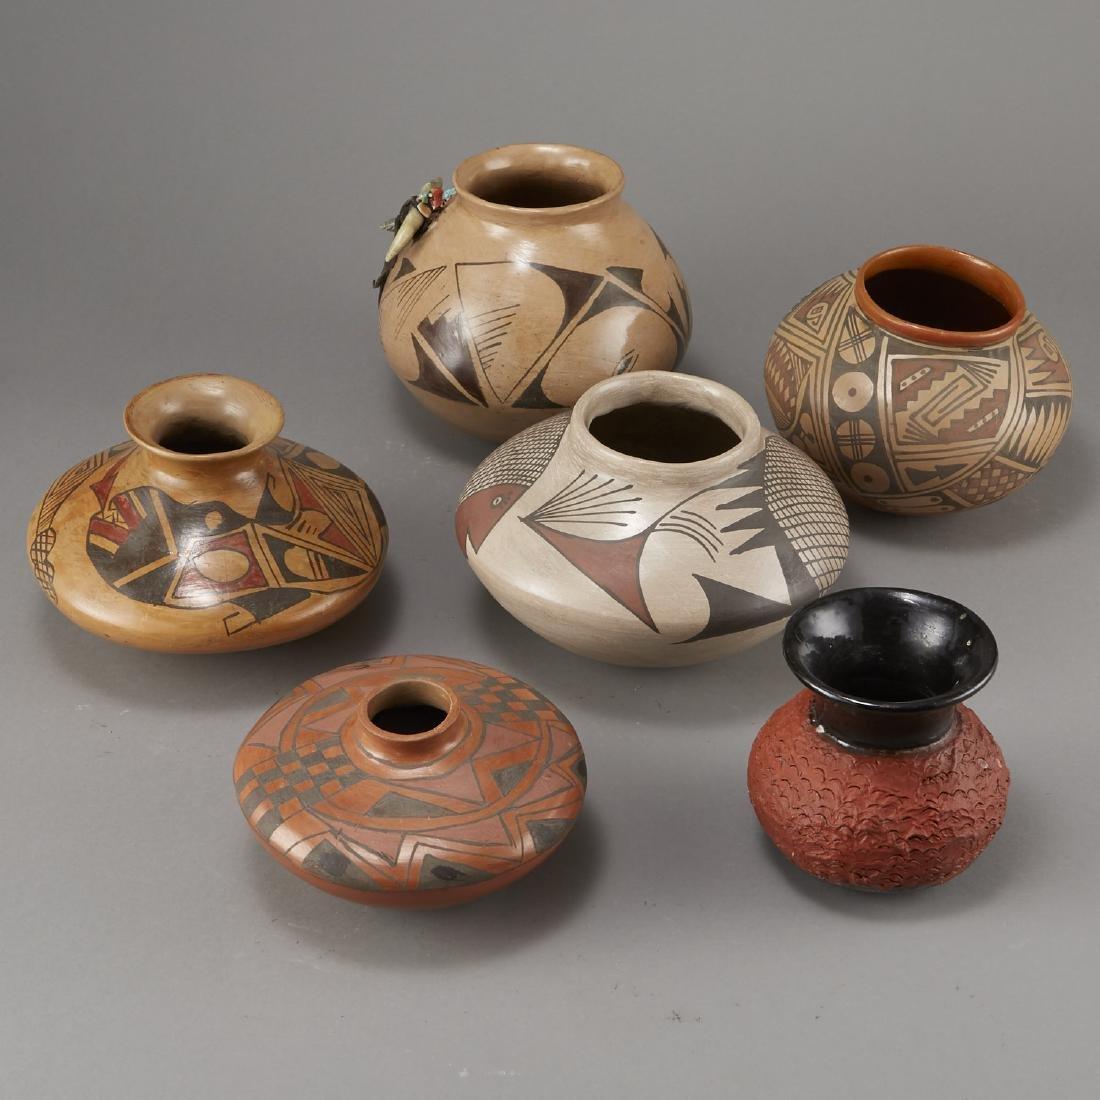 Group of 6 Polychrome Jars Fetish - 2